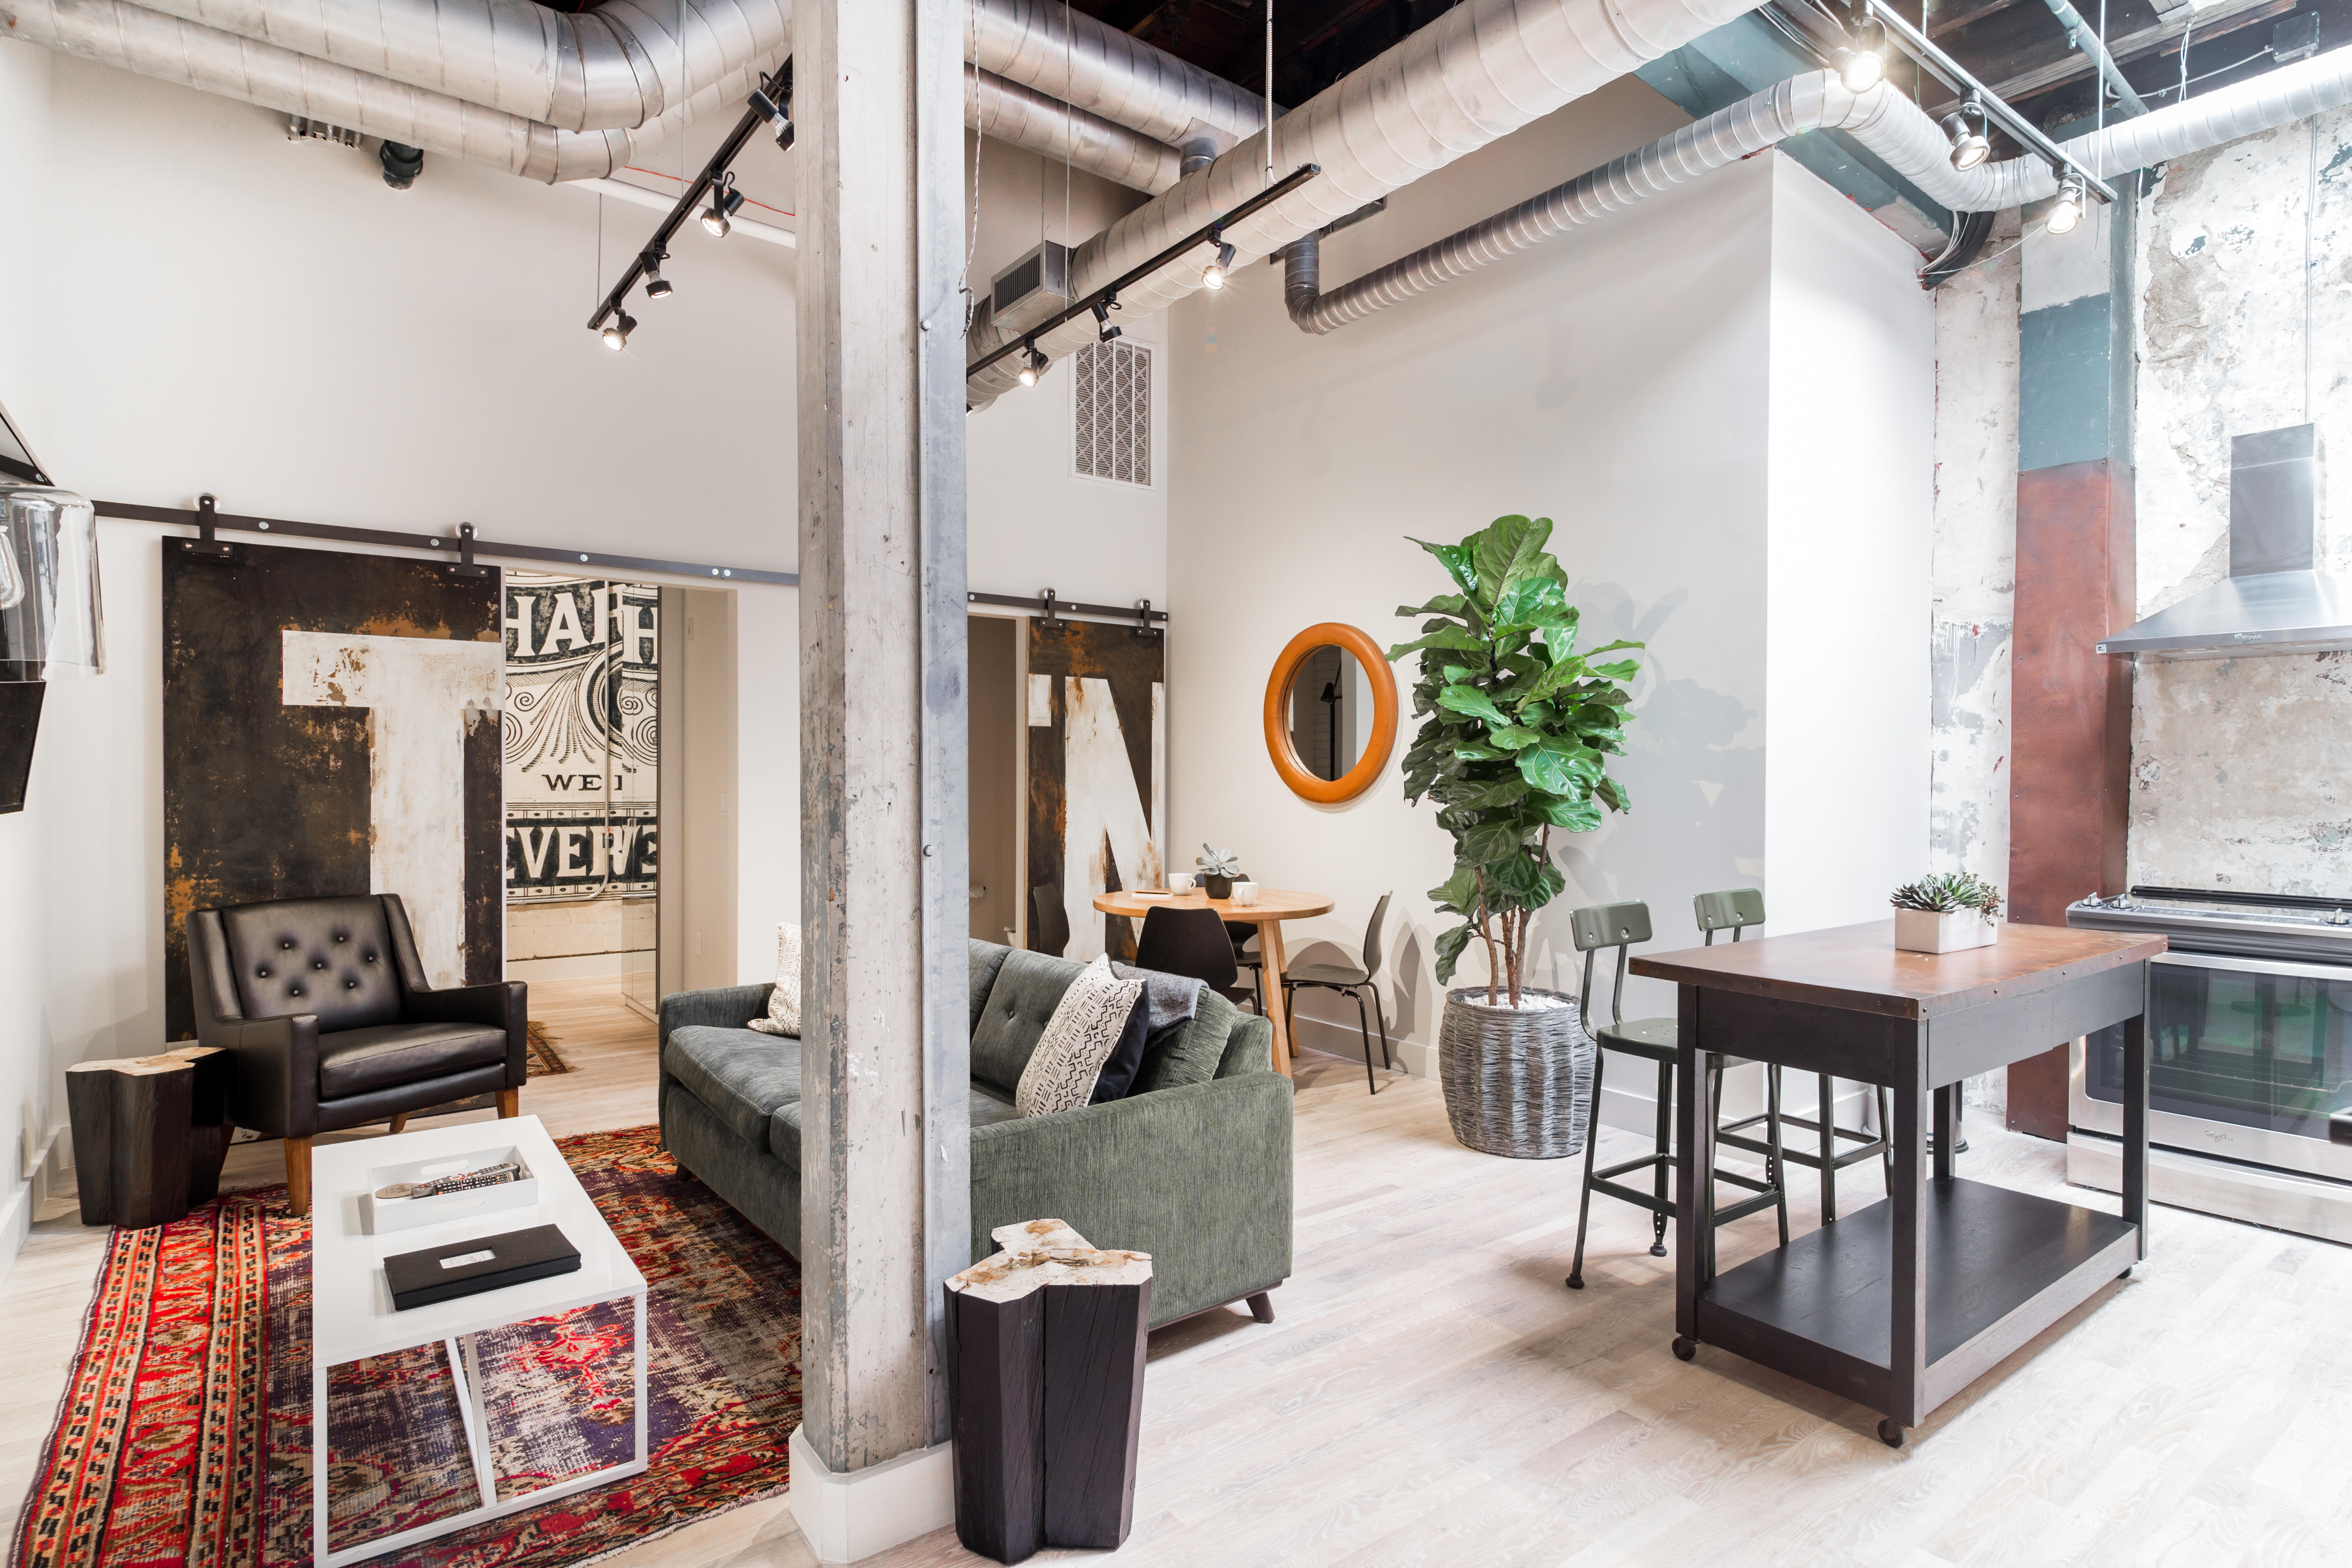 506 Lofts- Nashville Vacation Rentals image 1